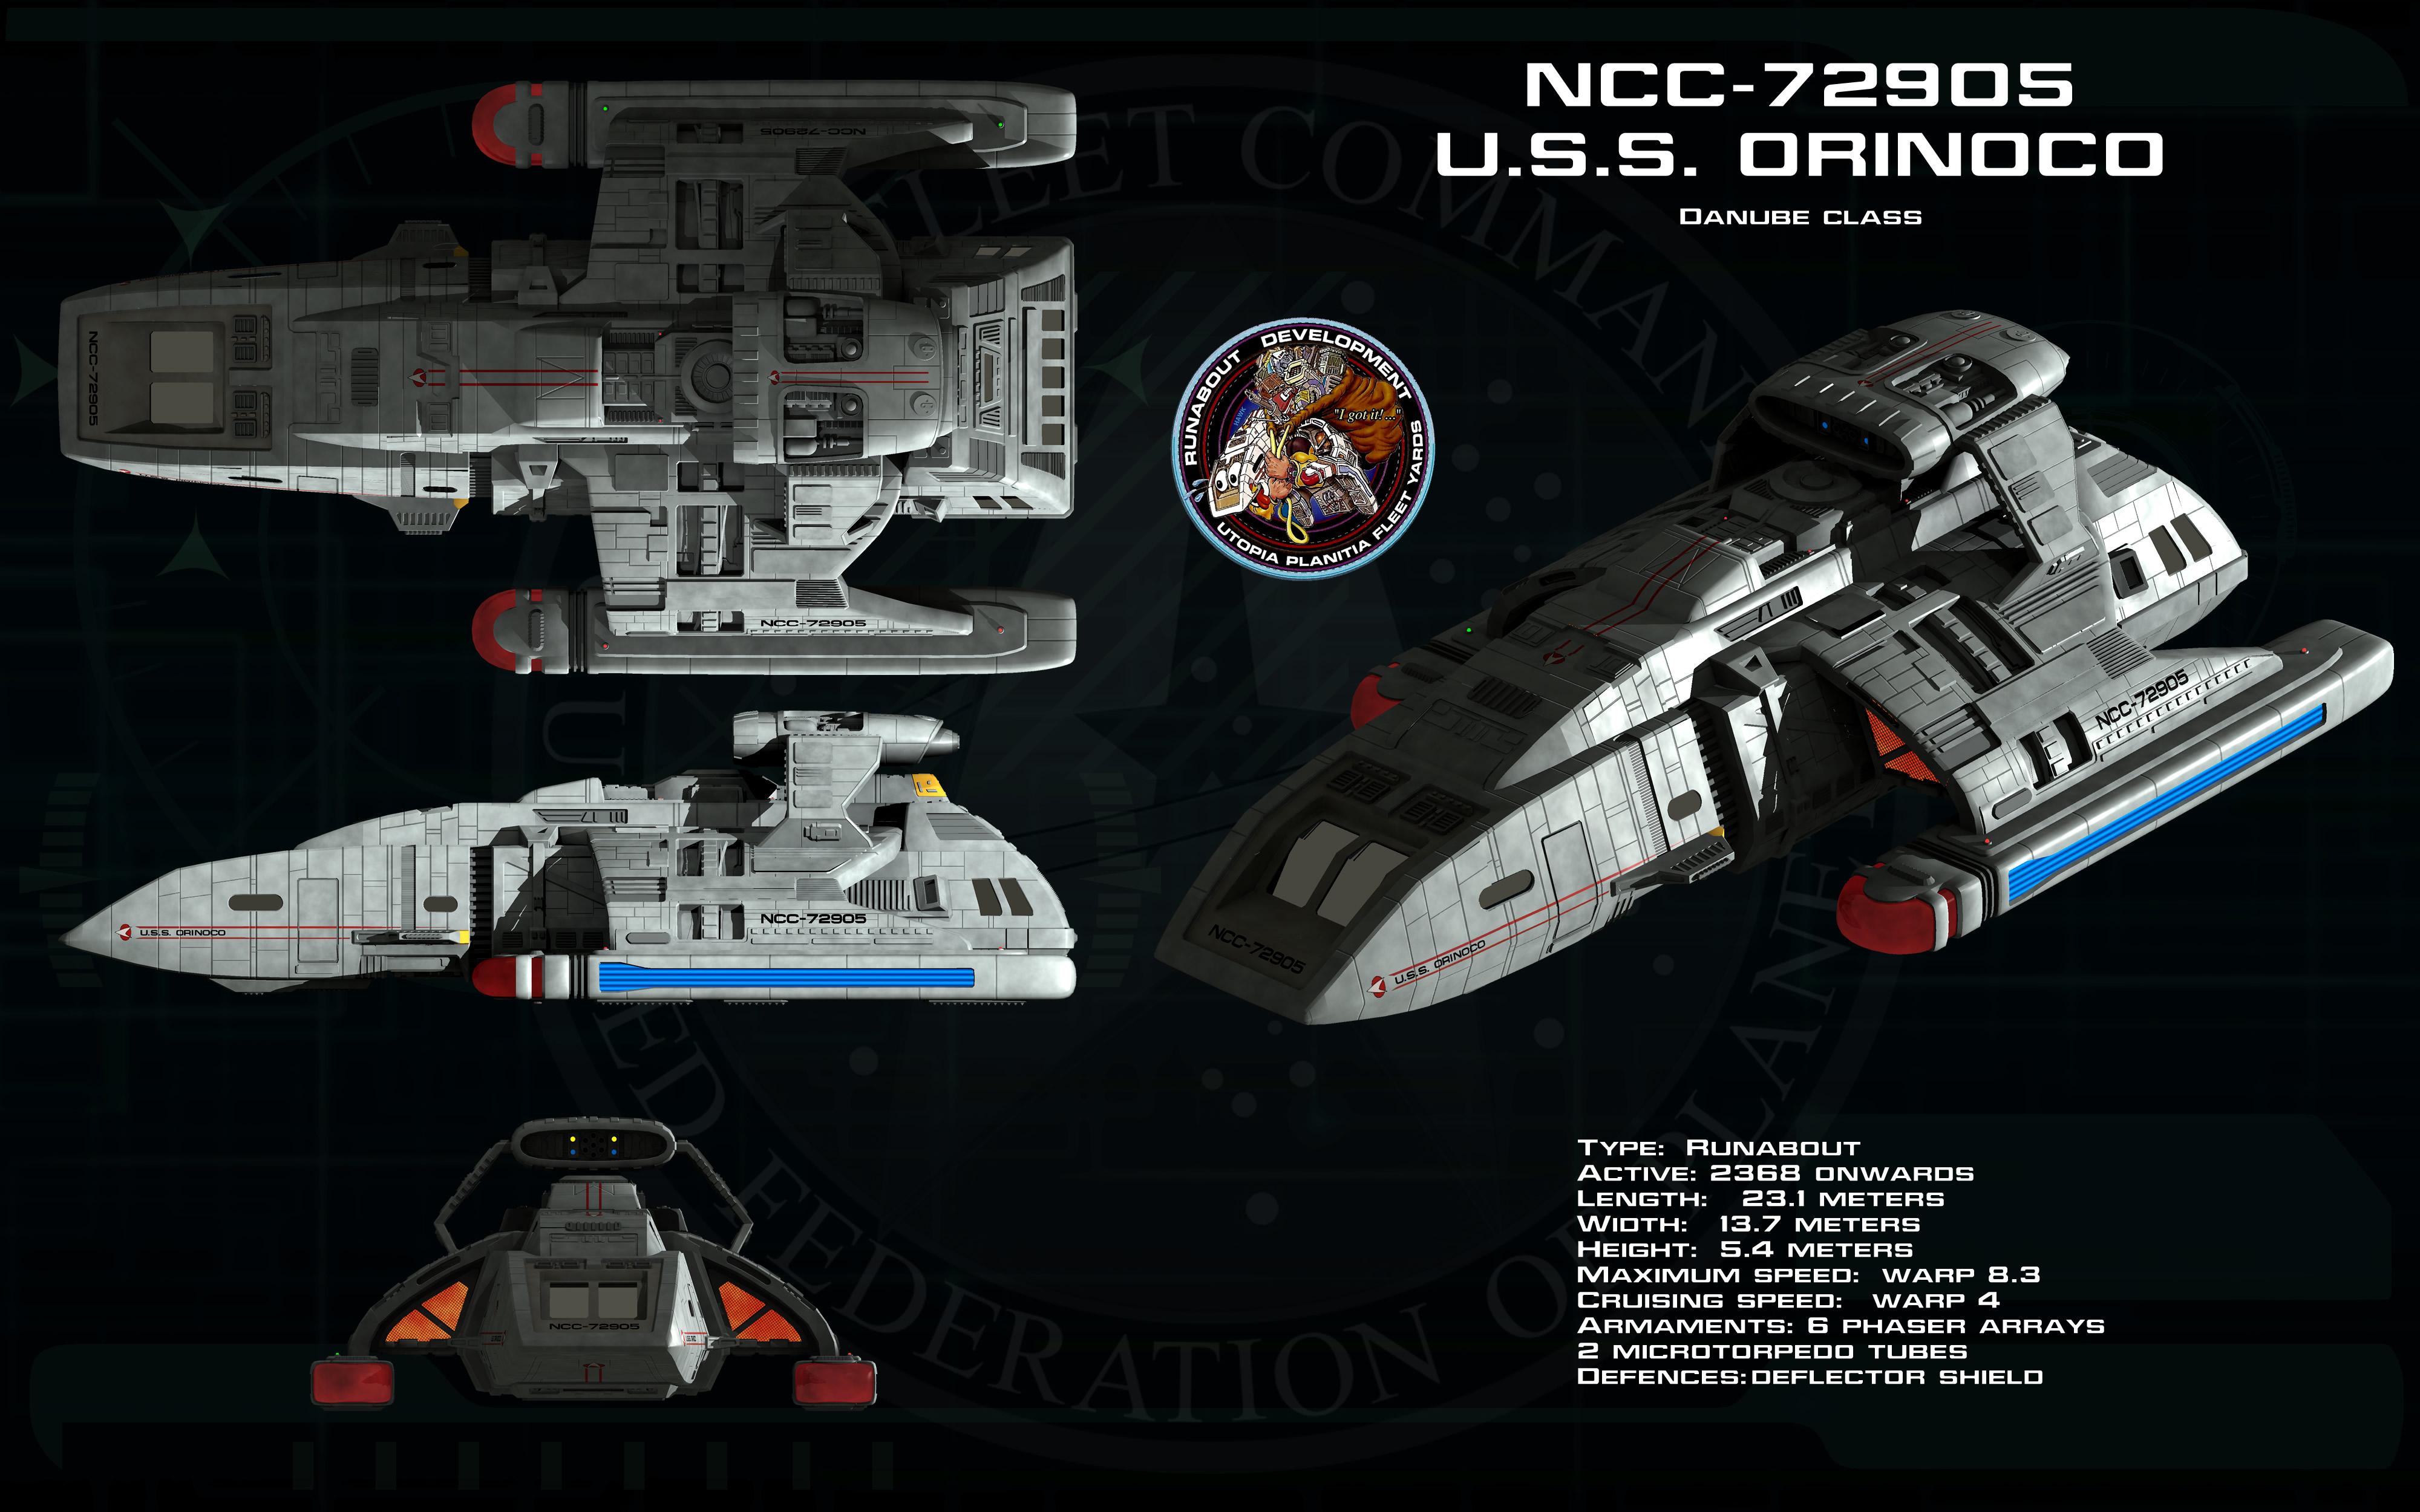 Danube Class Ortho Updated 449160604 on Star Trek Deep Space Nine Interior